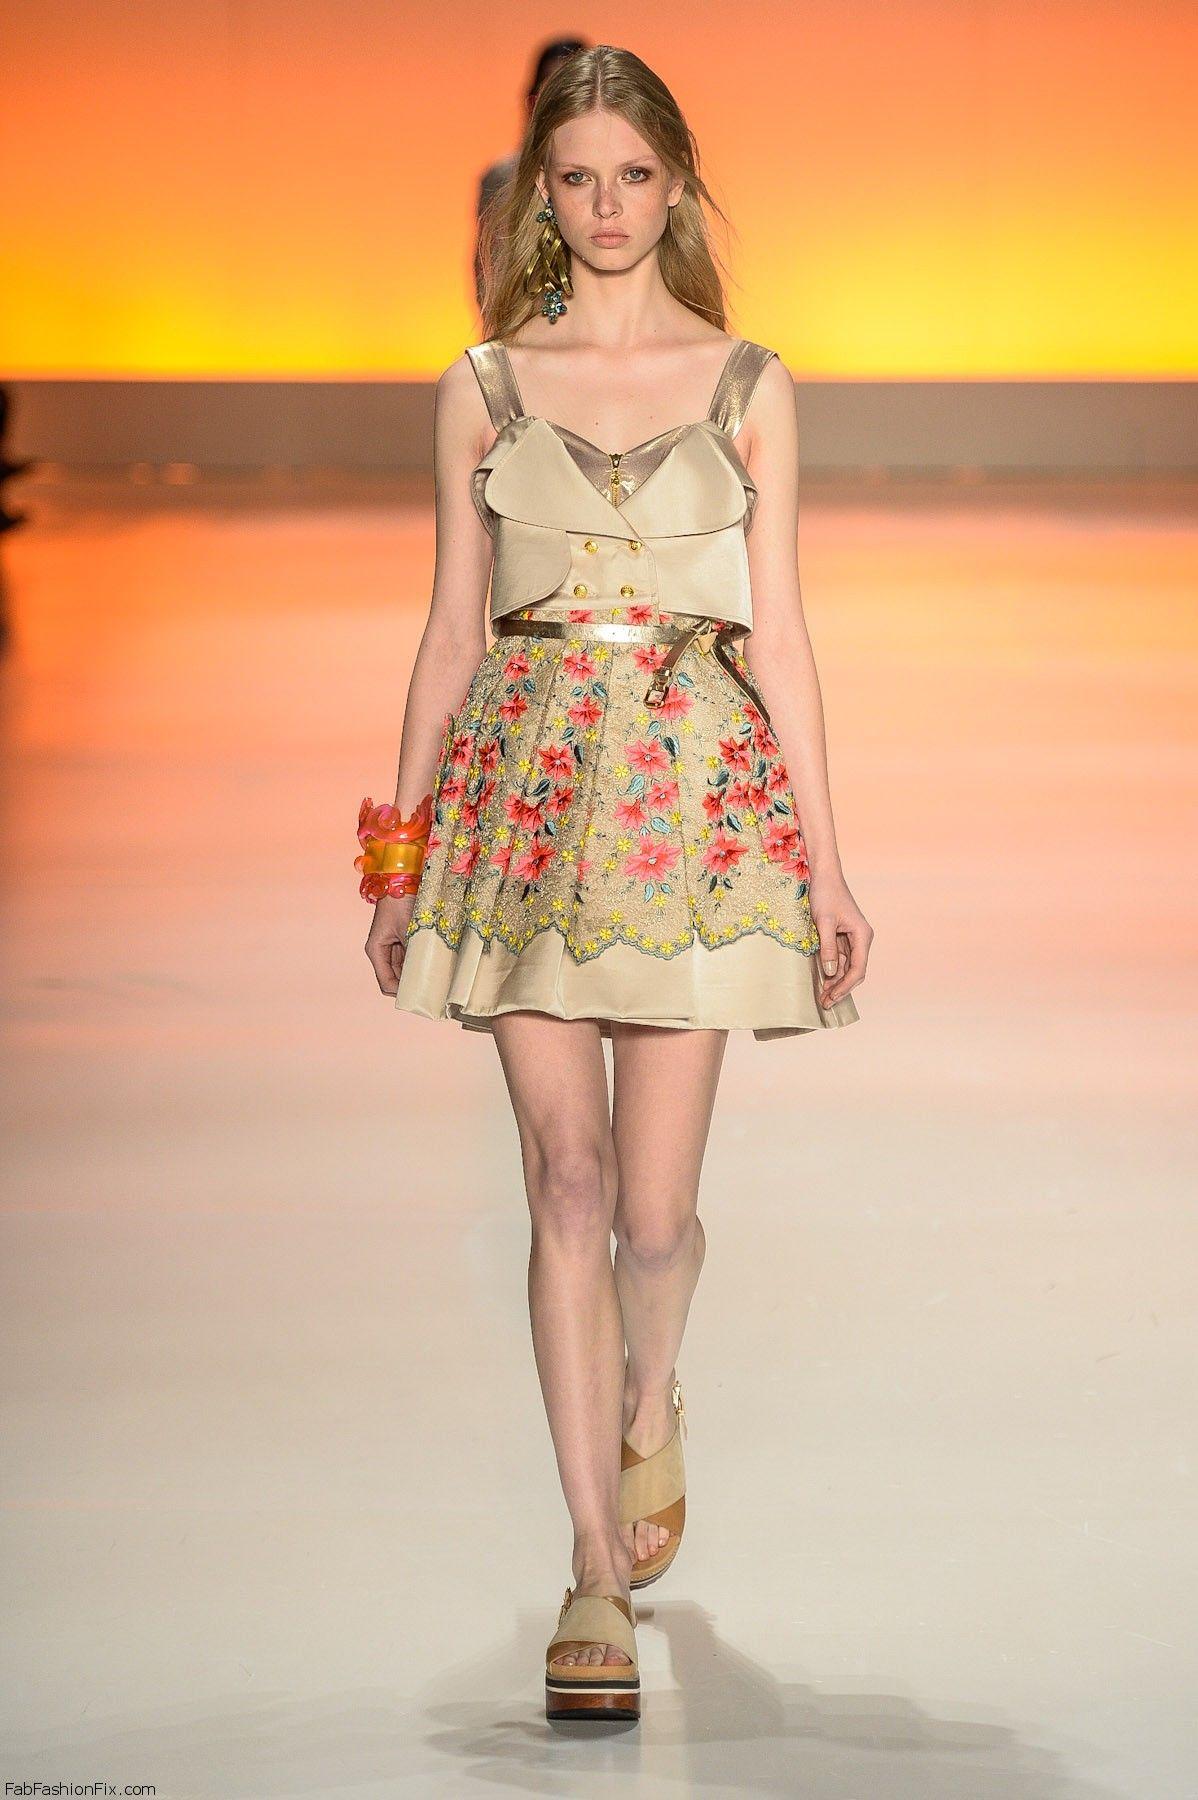 Triton spring/summer 2015 – Sao Paulo Fashion Week